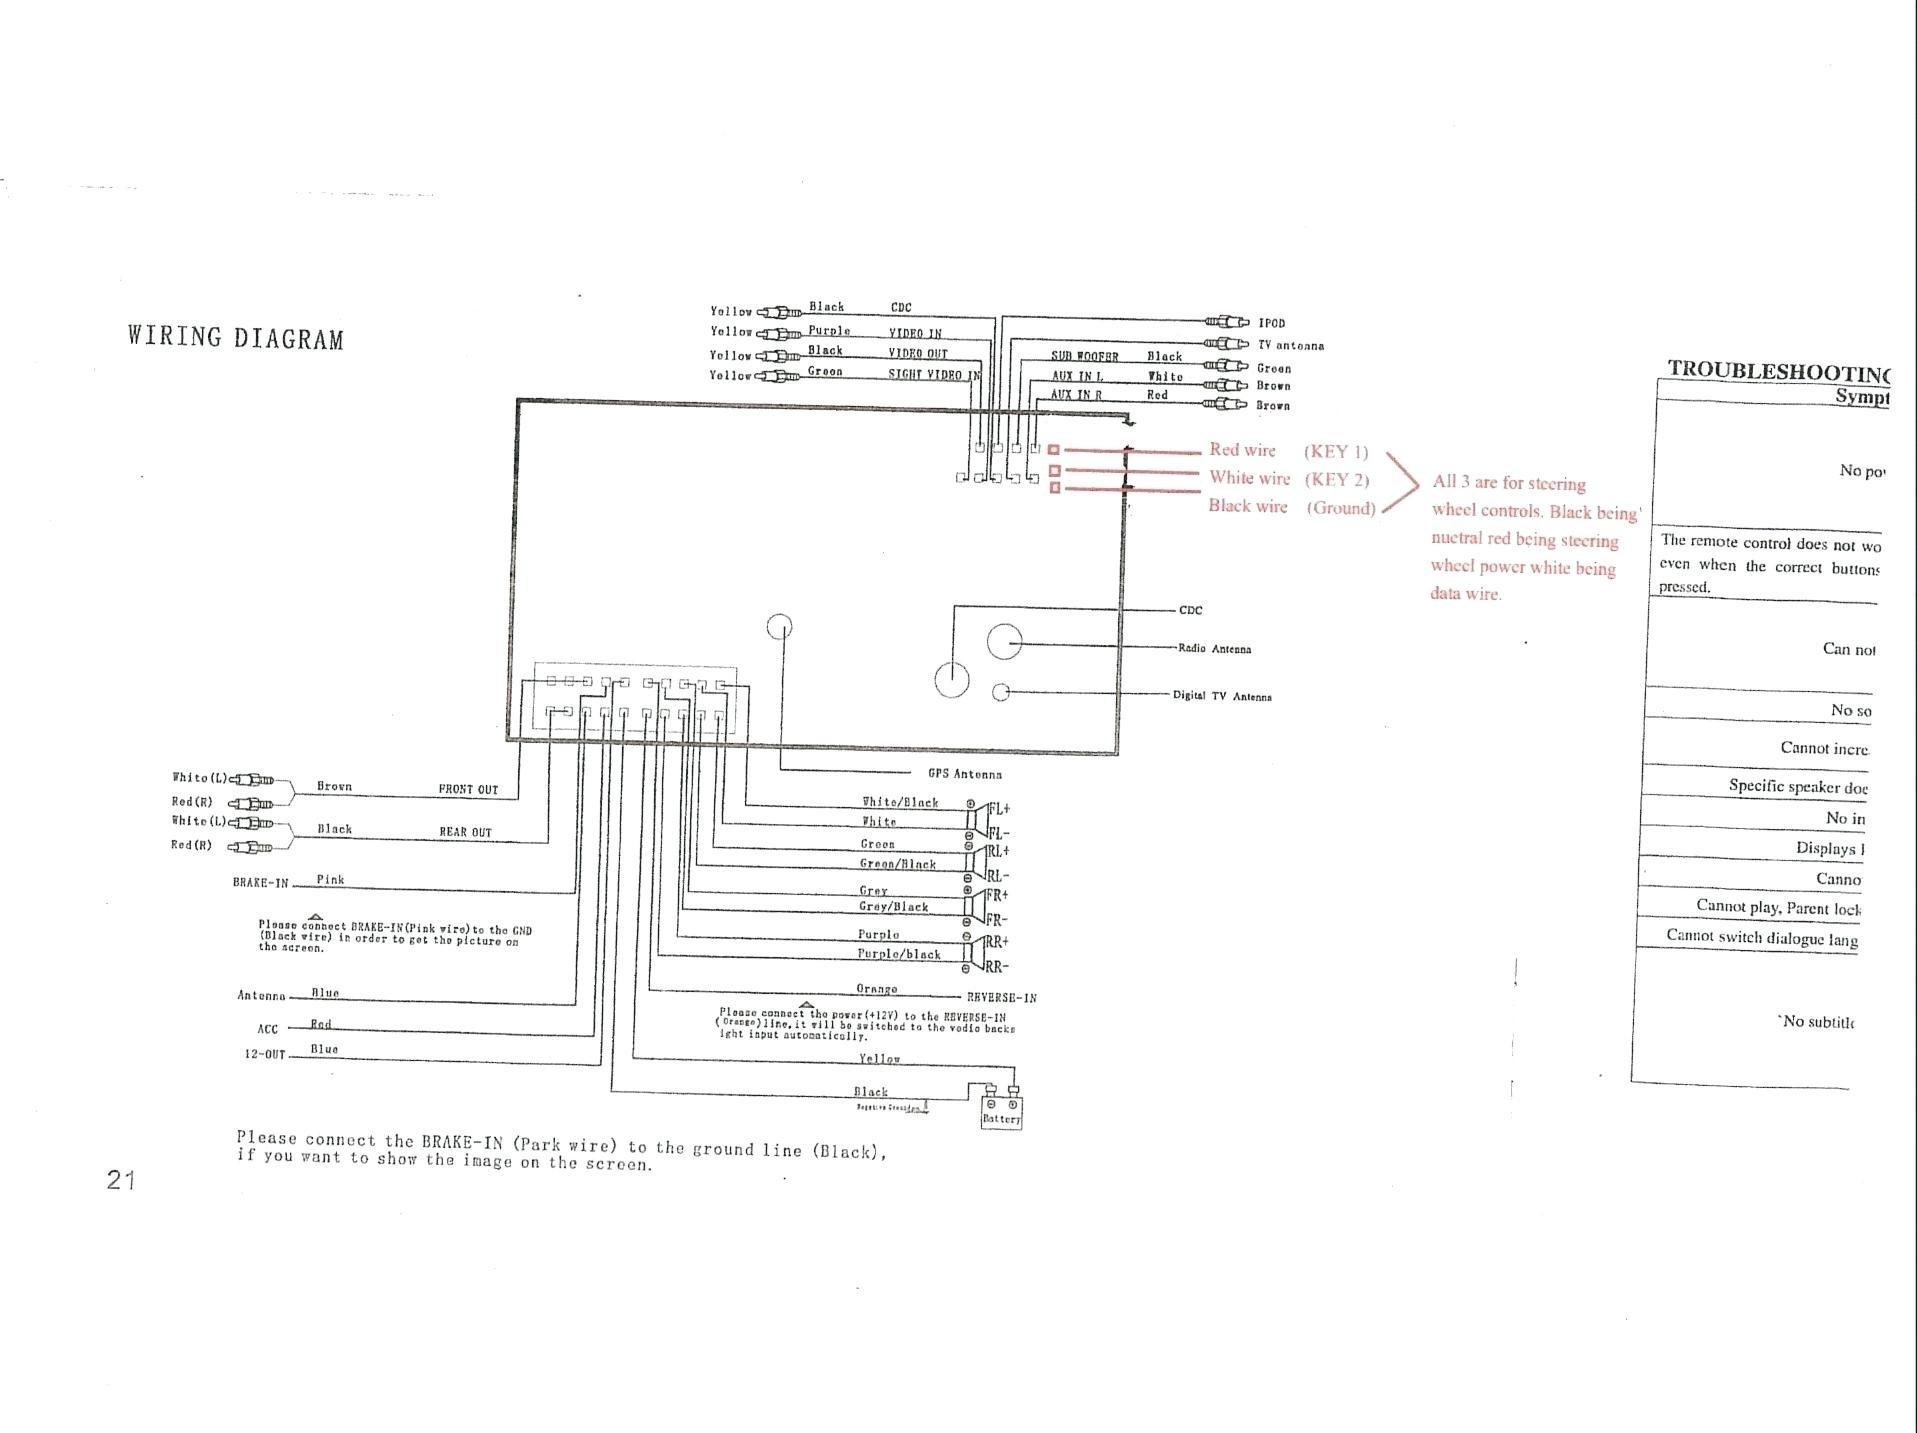 gmos 04 wiring diagram Download-gmos 04 wiring diagram Download gmos 04 wiring harness Gmos01 Wiring Diagram Axxess Gmos 01 DOWNLOAD Wiring Diagram Detail Name gmos 04 4-e